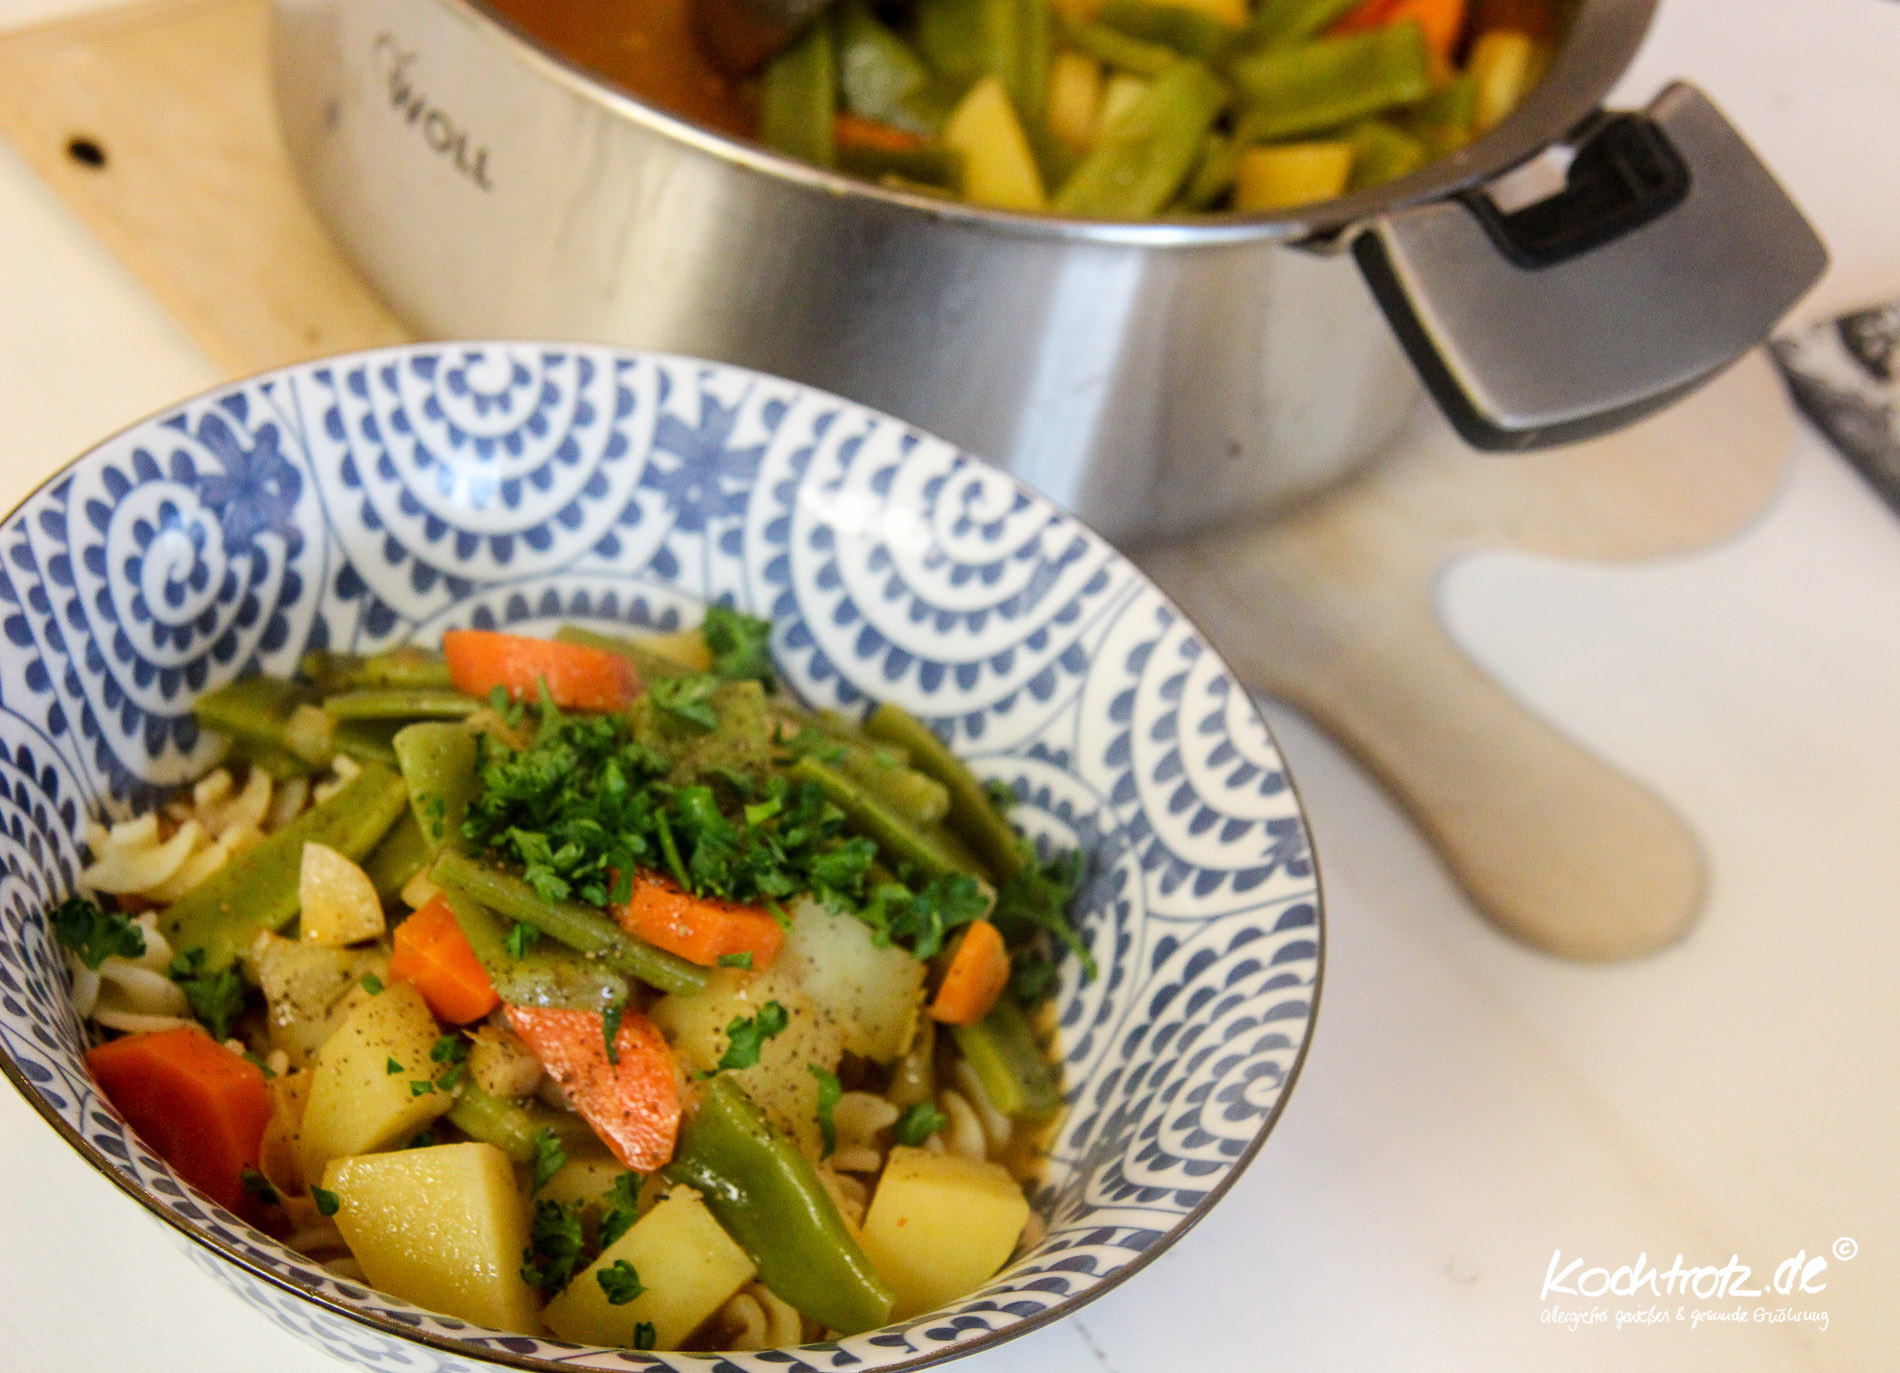 eintopf-gruene-bohnen-karotten-pastinake-kartoffel-1